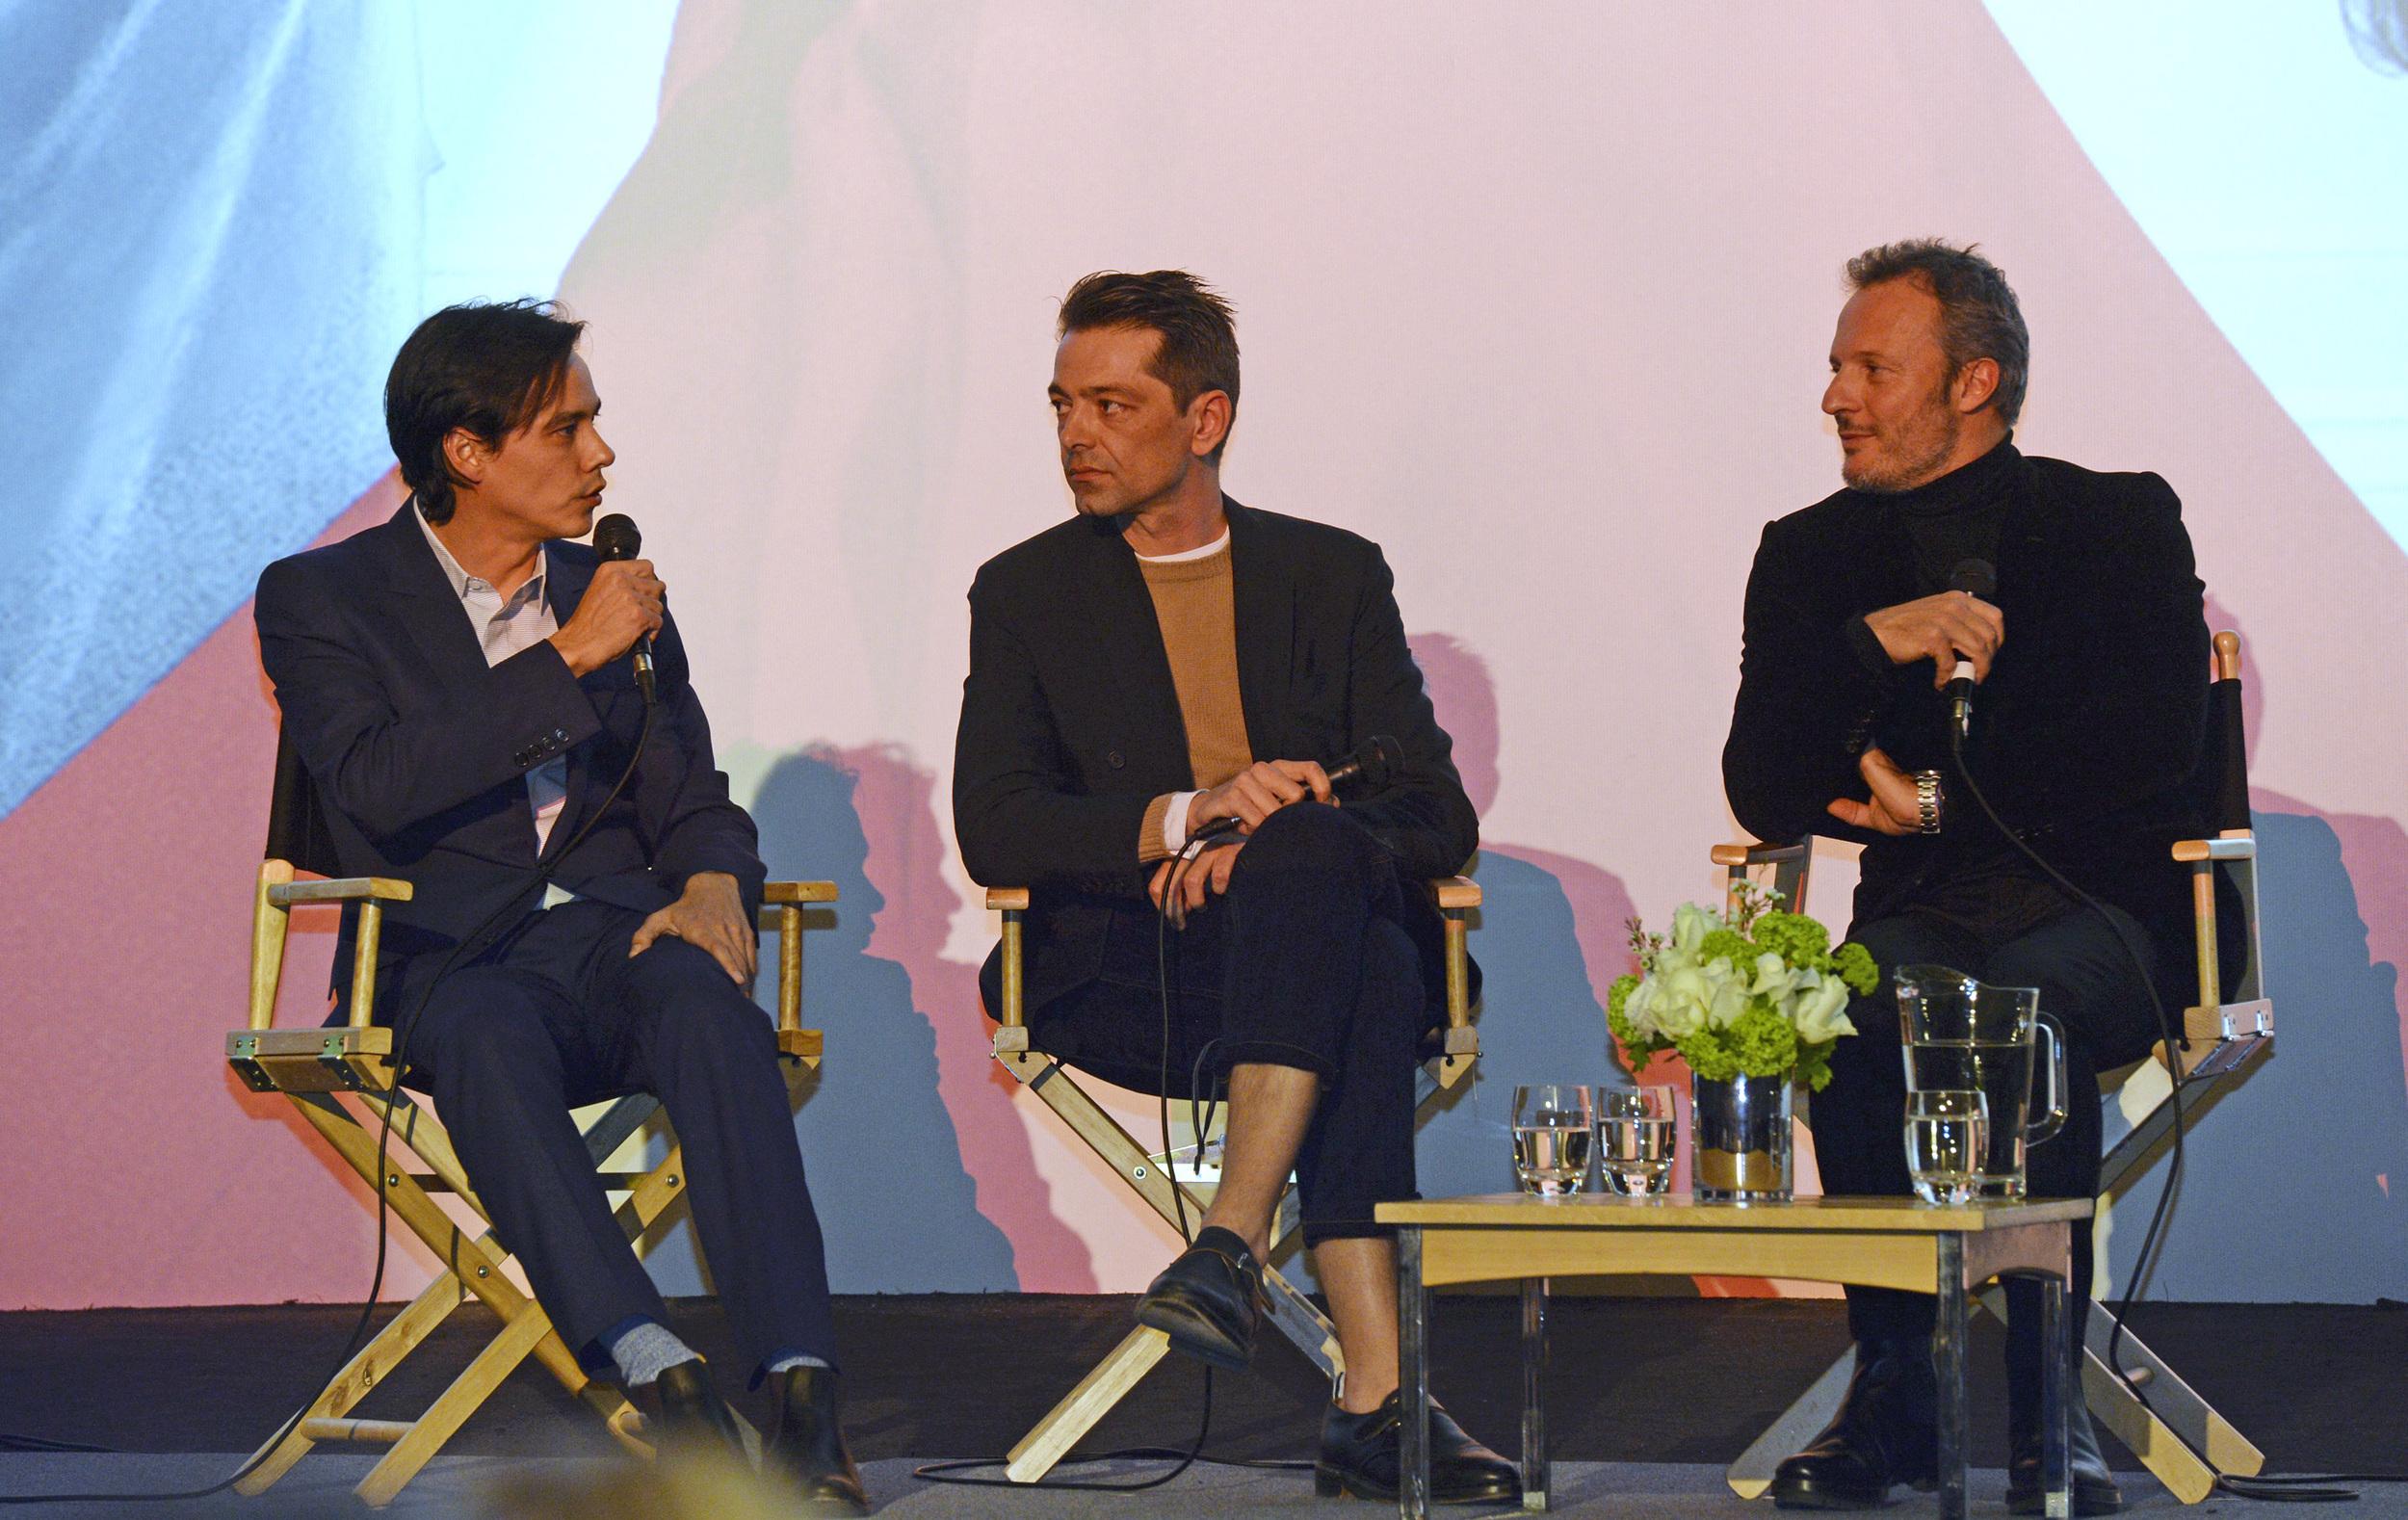 Frederic Tch, Pieter Mulier, Olivier Bialobos.JPG